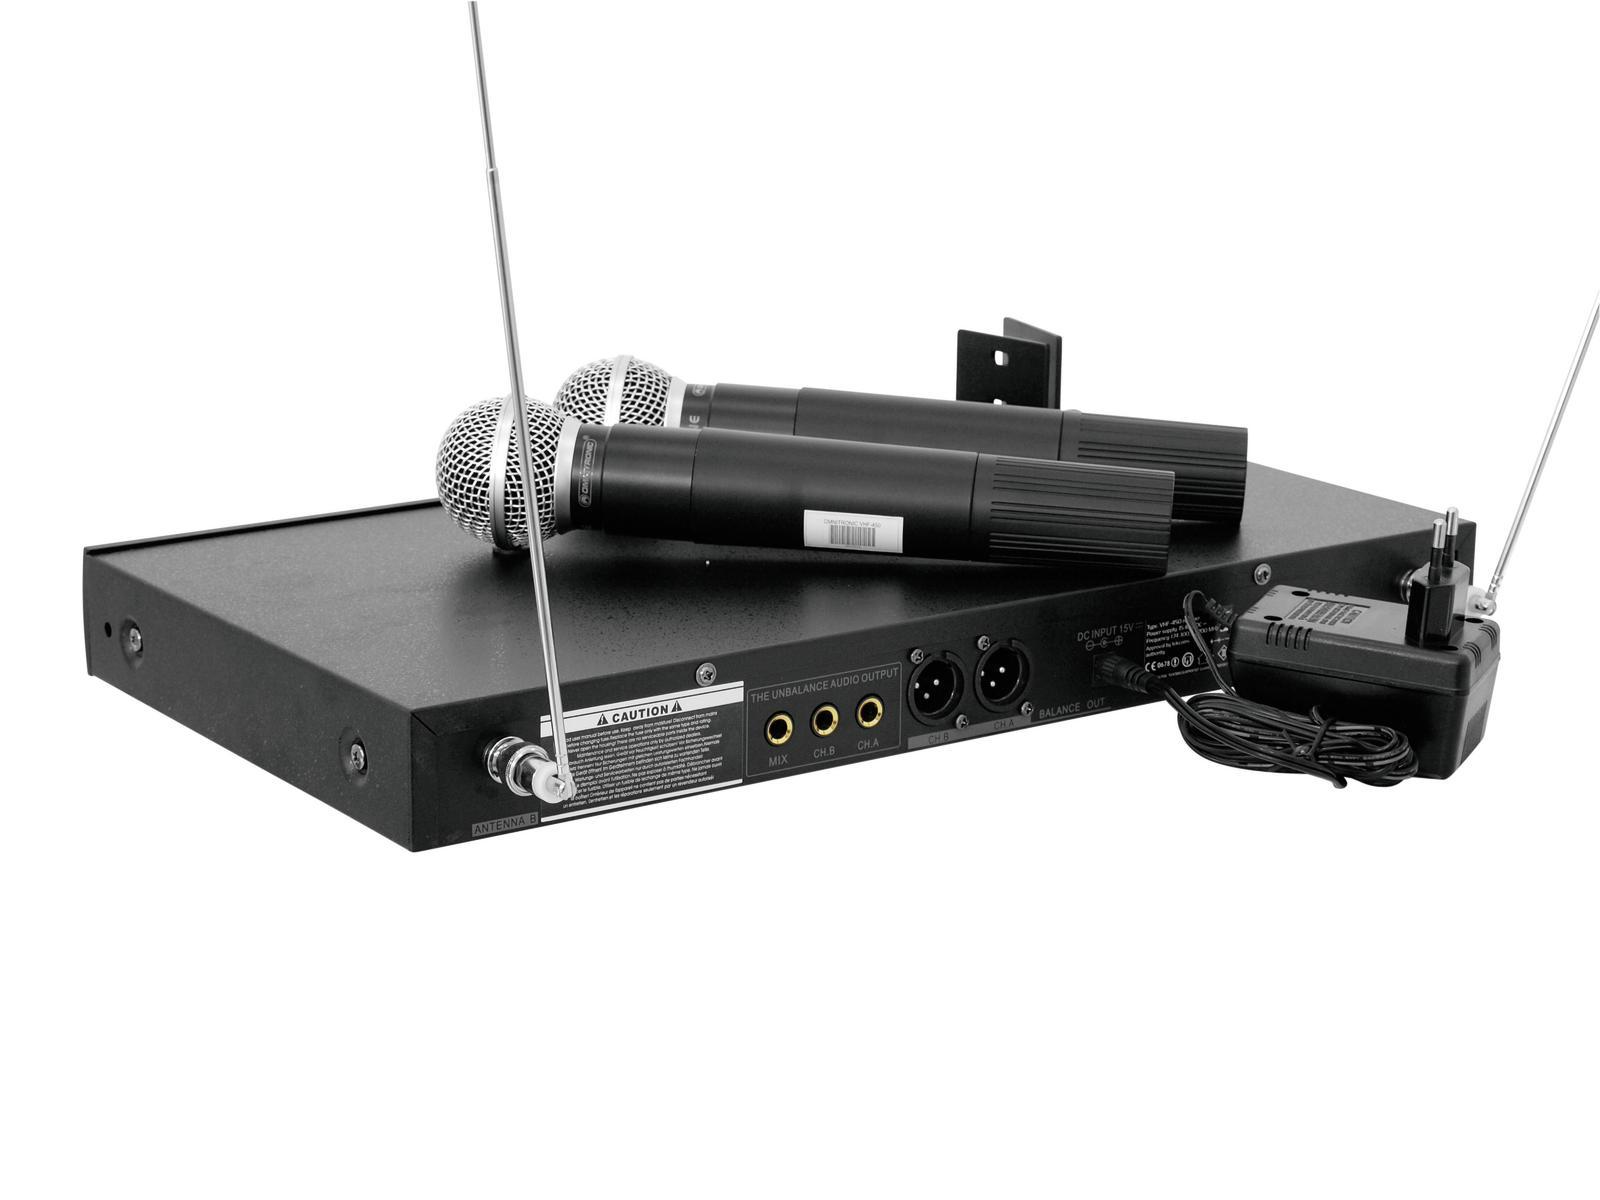 OMNITRONIC VHF-450 Funkmikrofon-System